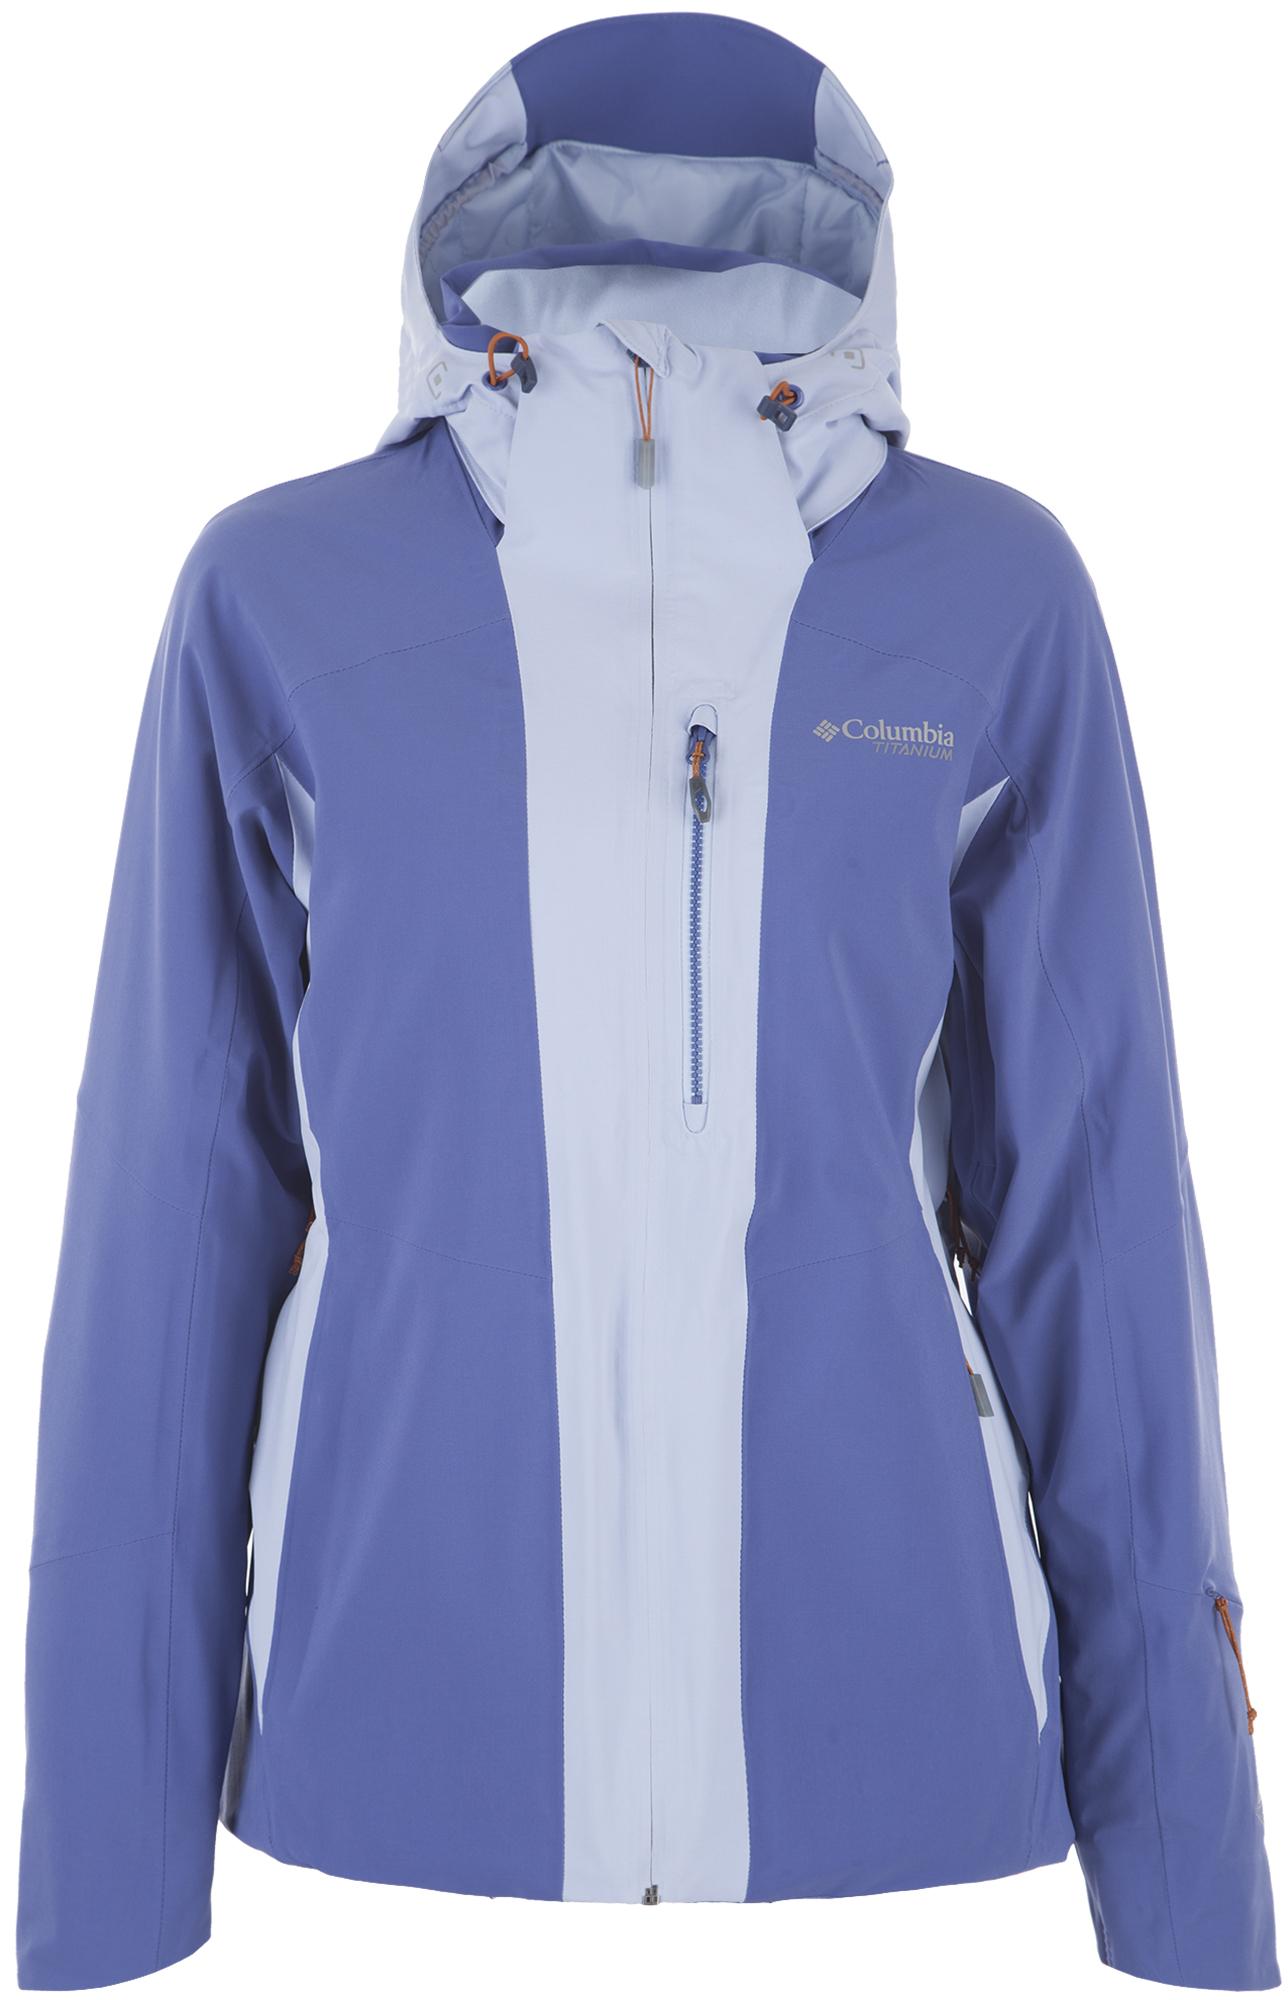 Columbia Куртка утепленная женская Columbia Snow Rival, размер 48